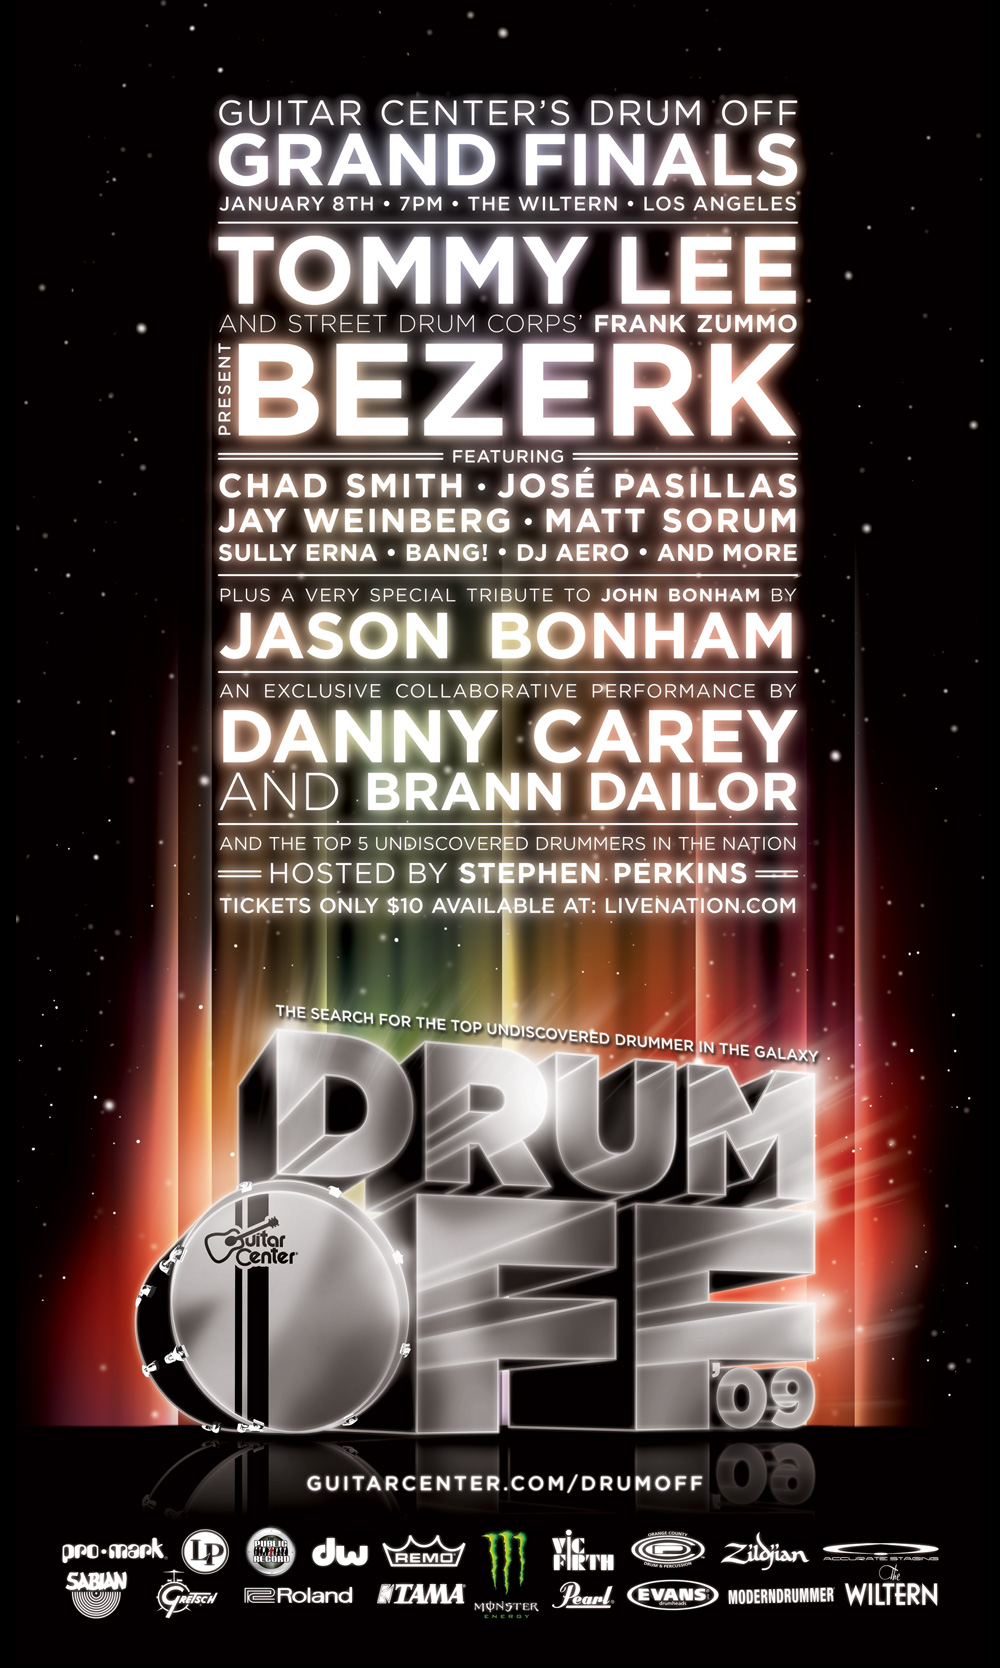 Drum-Off-2009-Finals-Poster.jpg